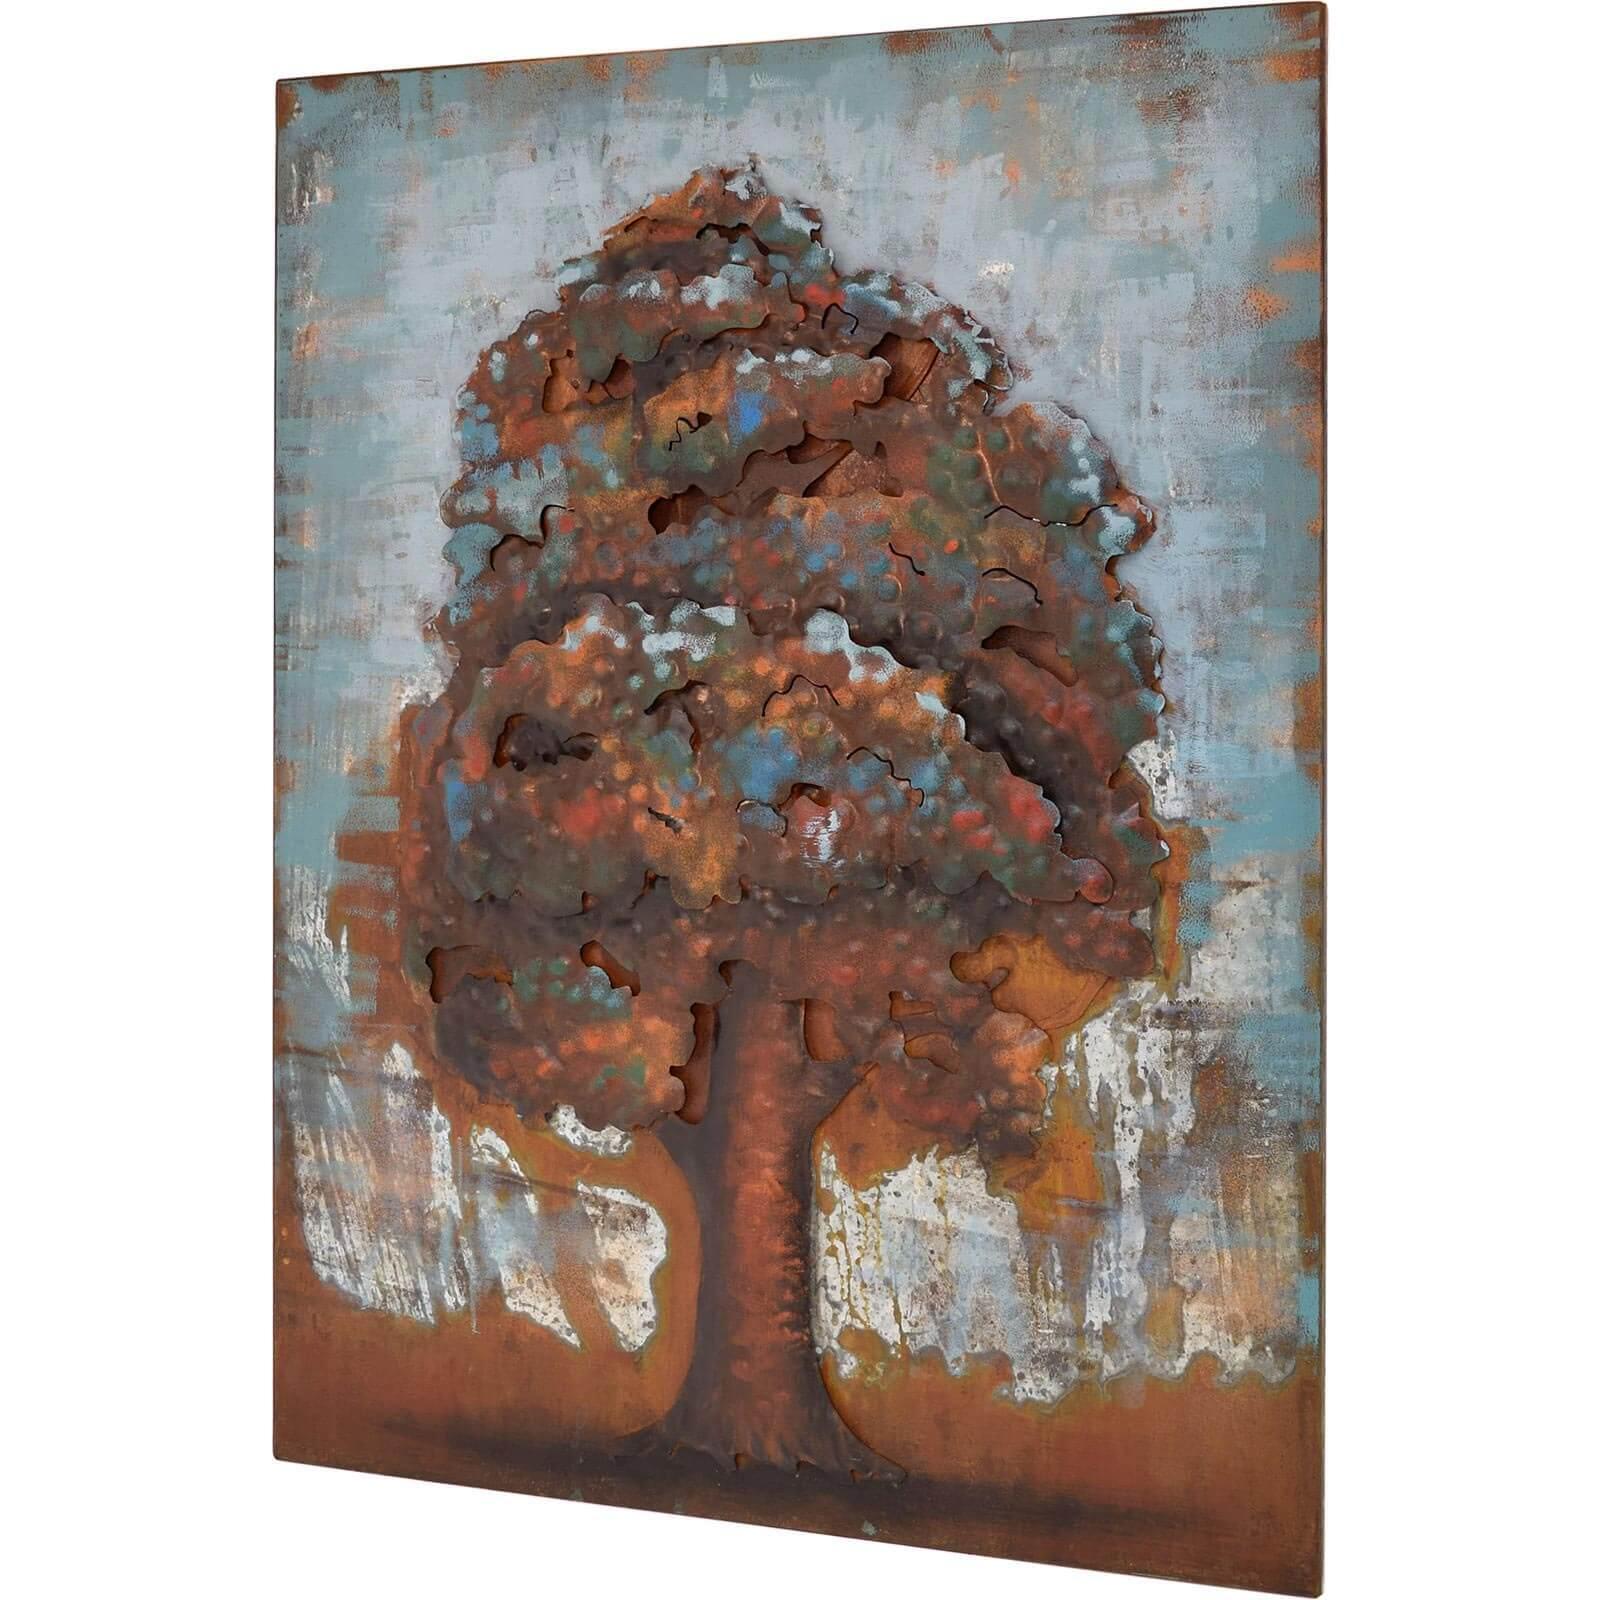 3D Metallbild  Baum Wandbild 60 x 80 cm